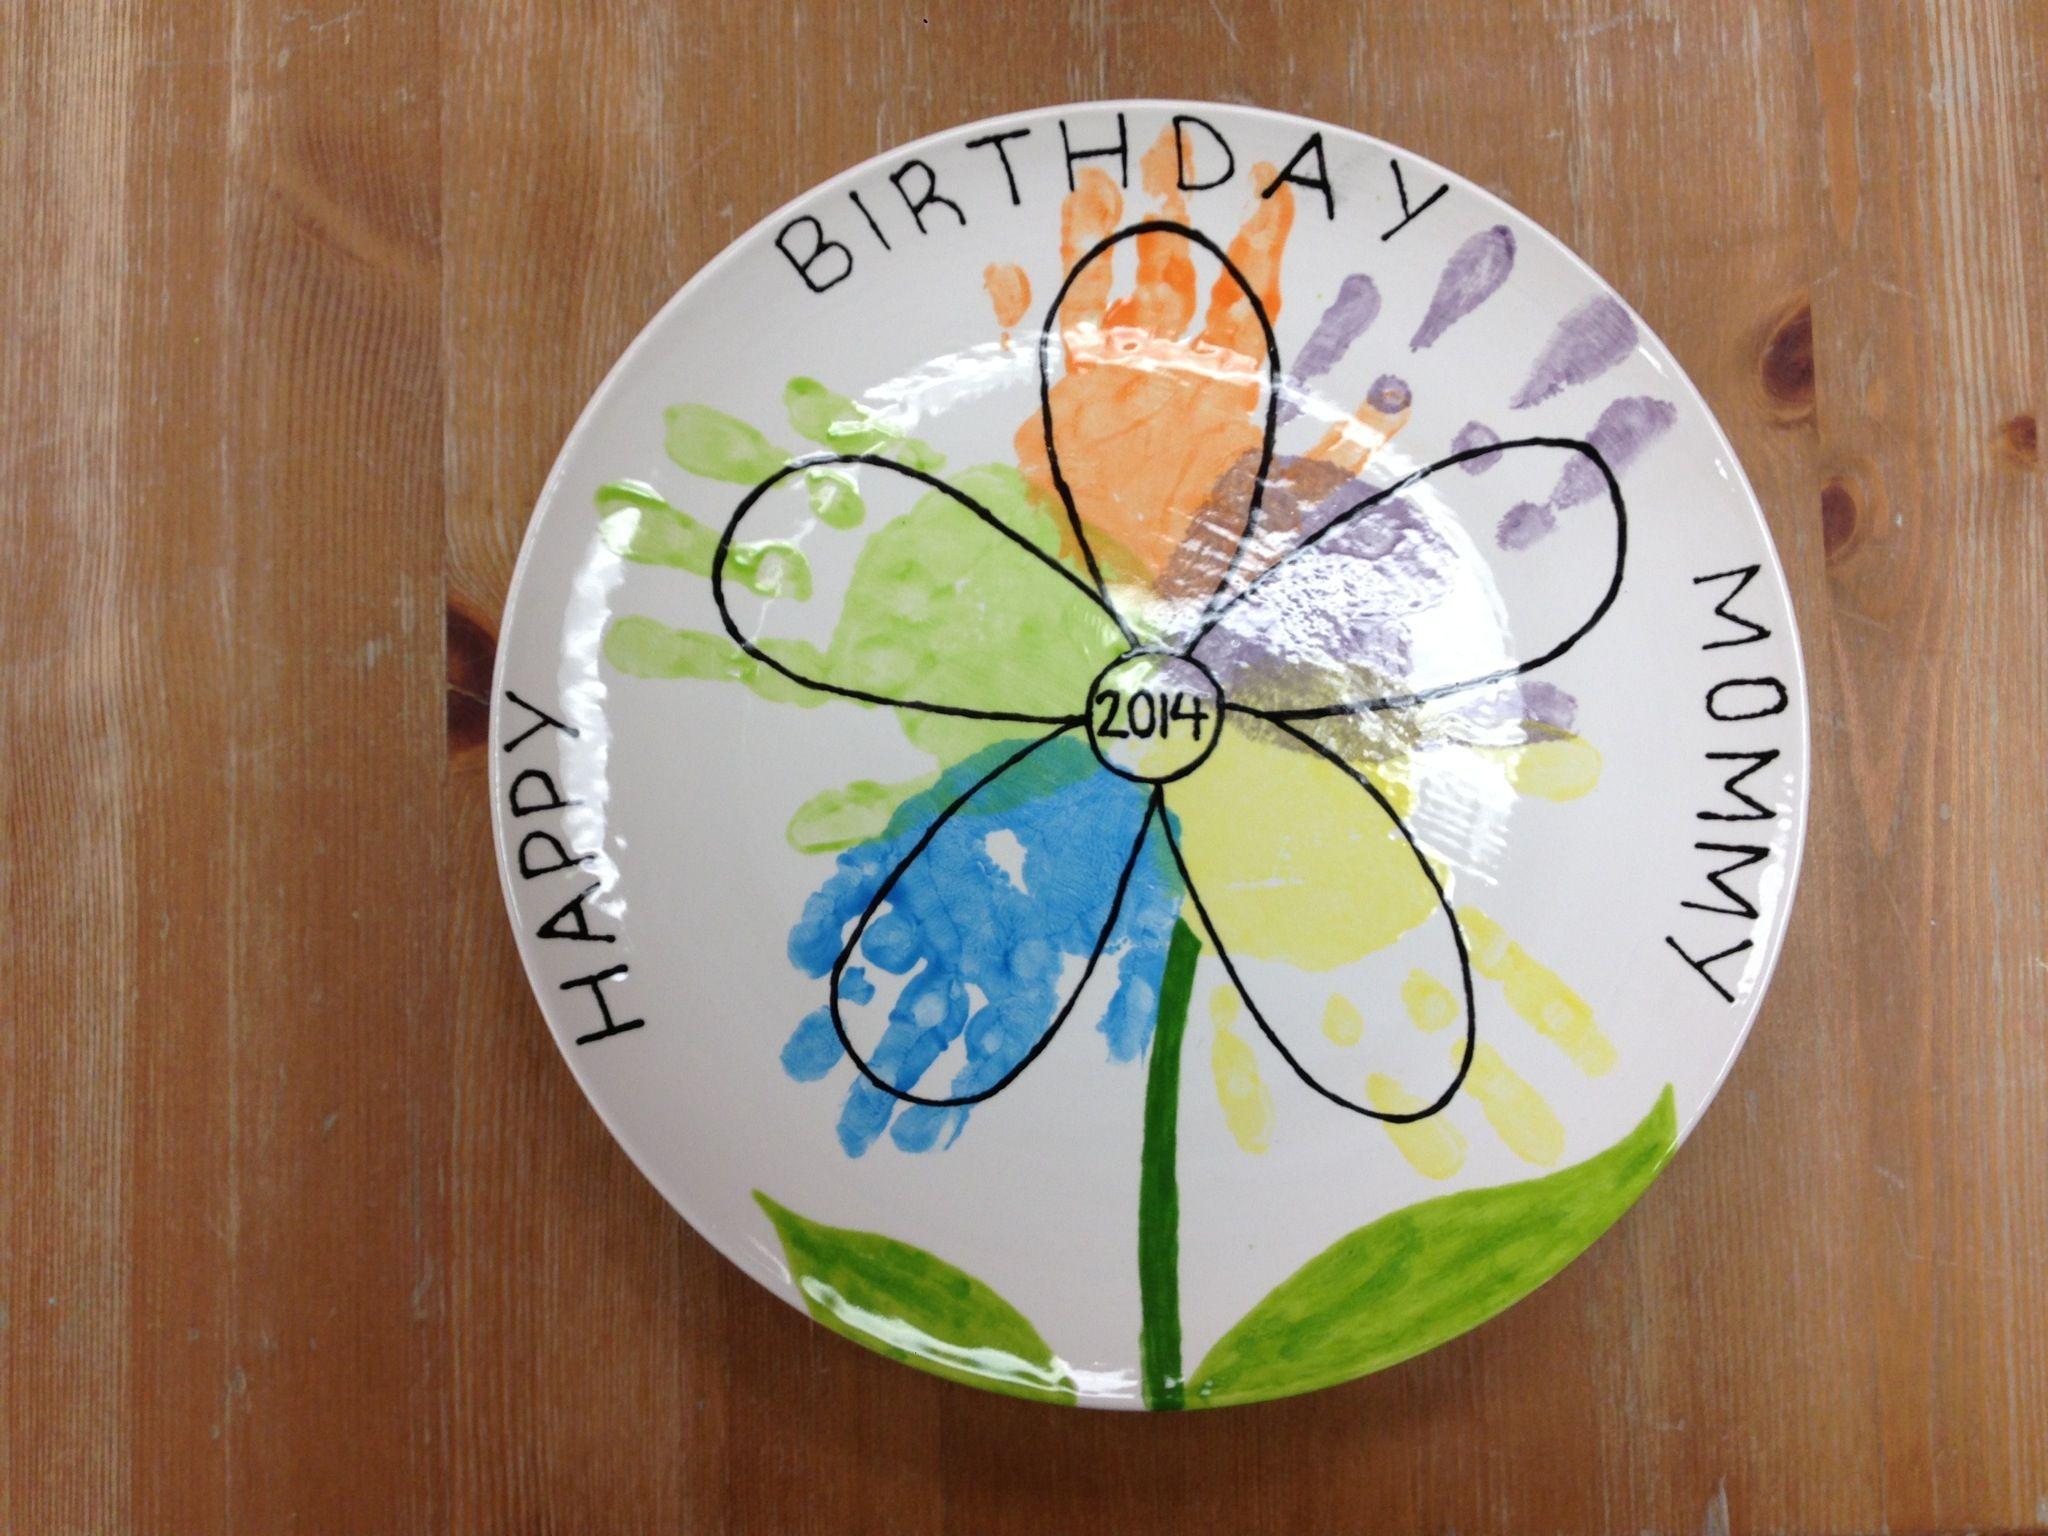 Ceramic plate with handprint flower design for mom made for Handprint ceramic plate ideas